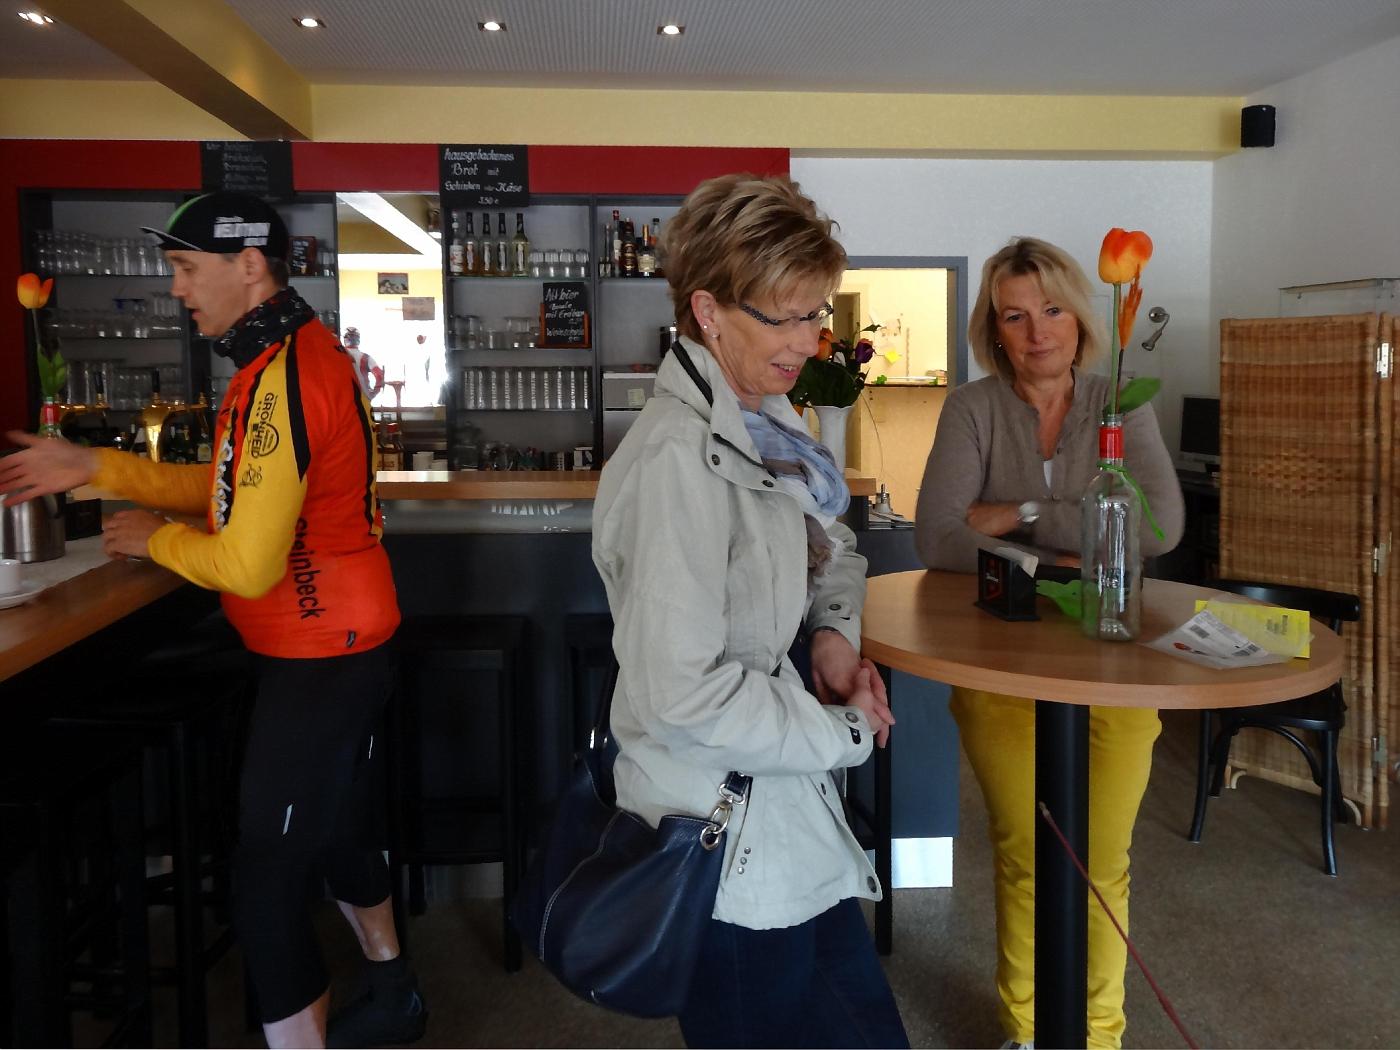 Im Café Remarque, Lohne